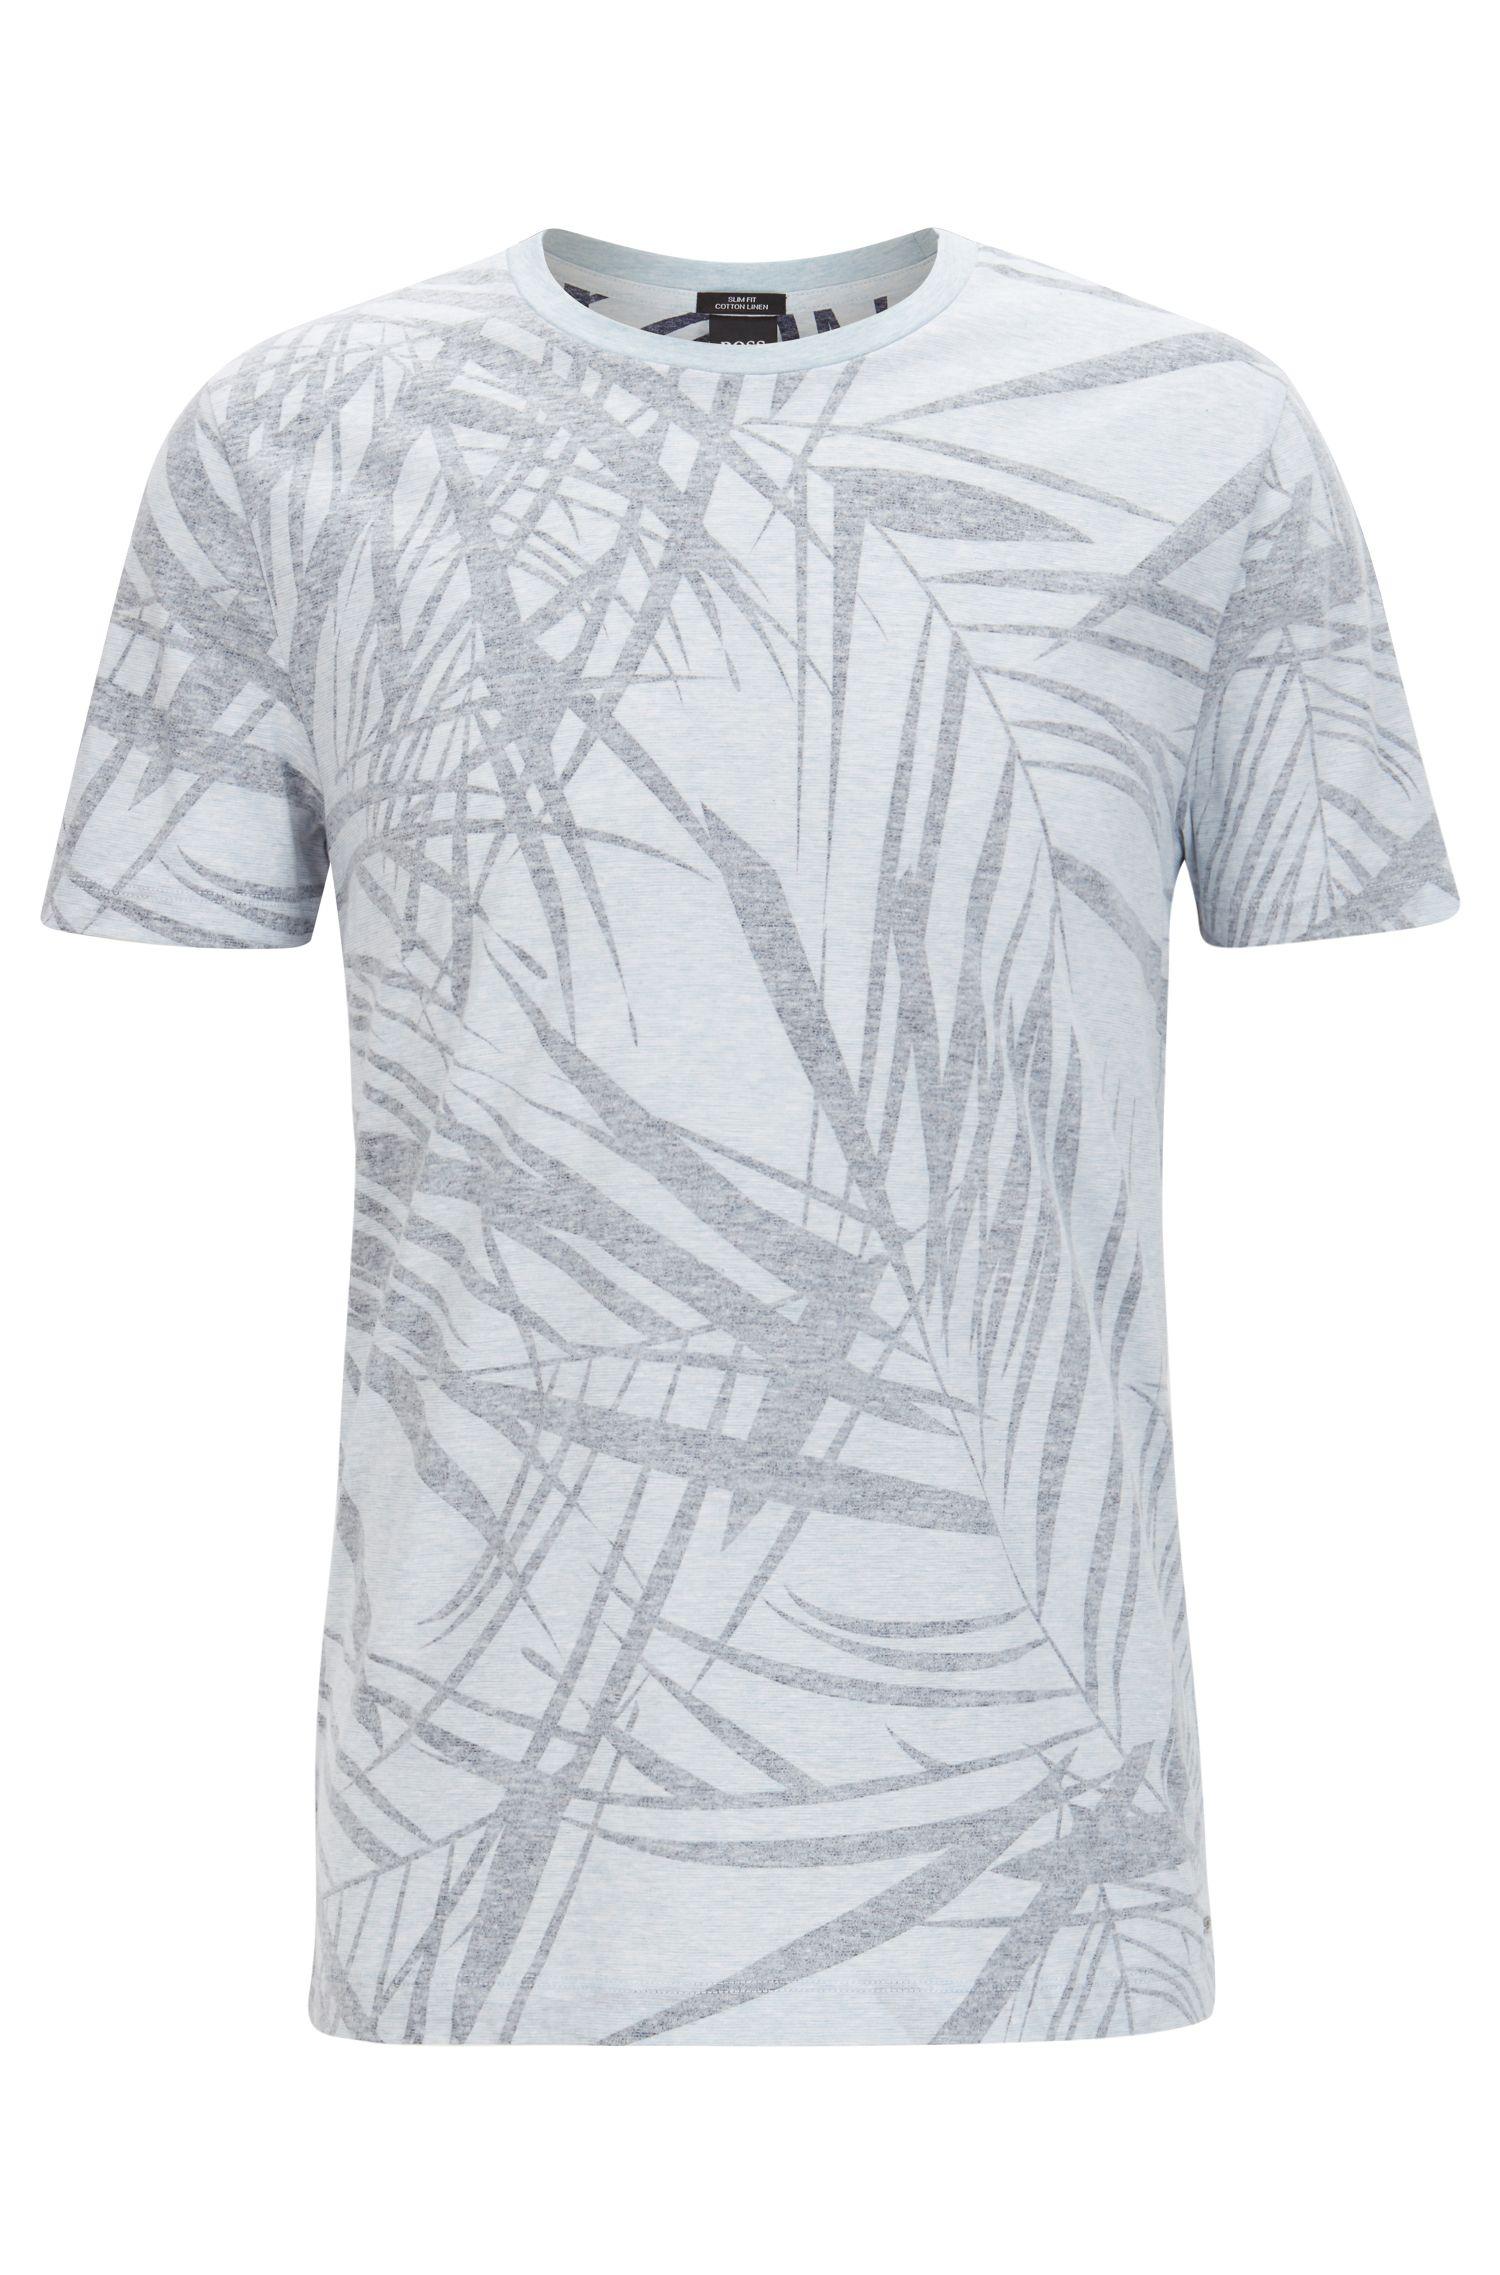 Leaf-Print Cotton Linen T-Shirt | Tessler, Dark Blue